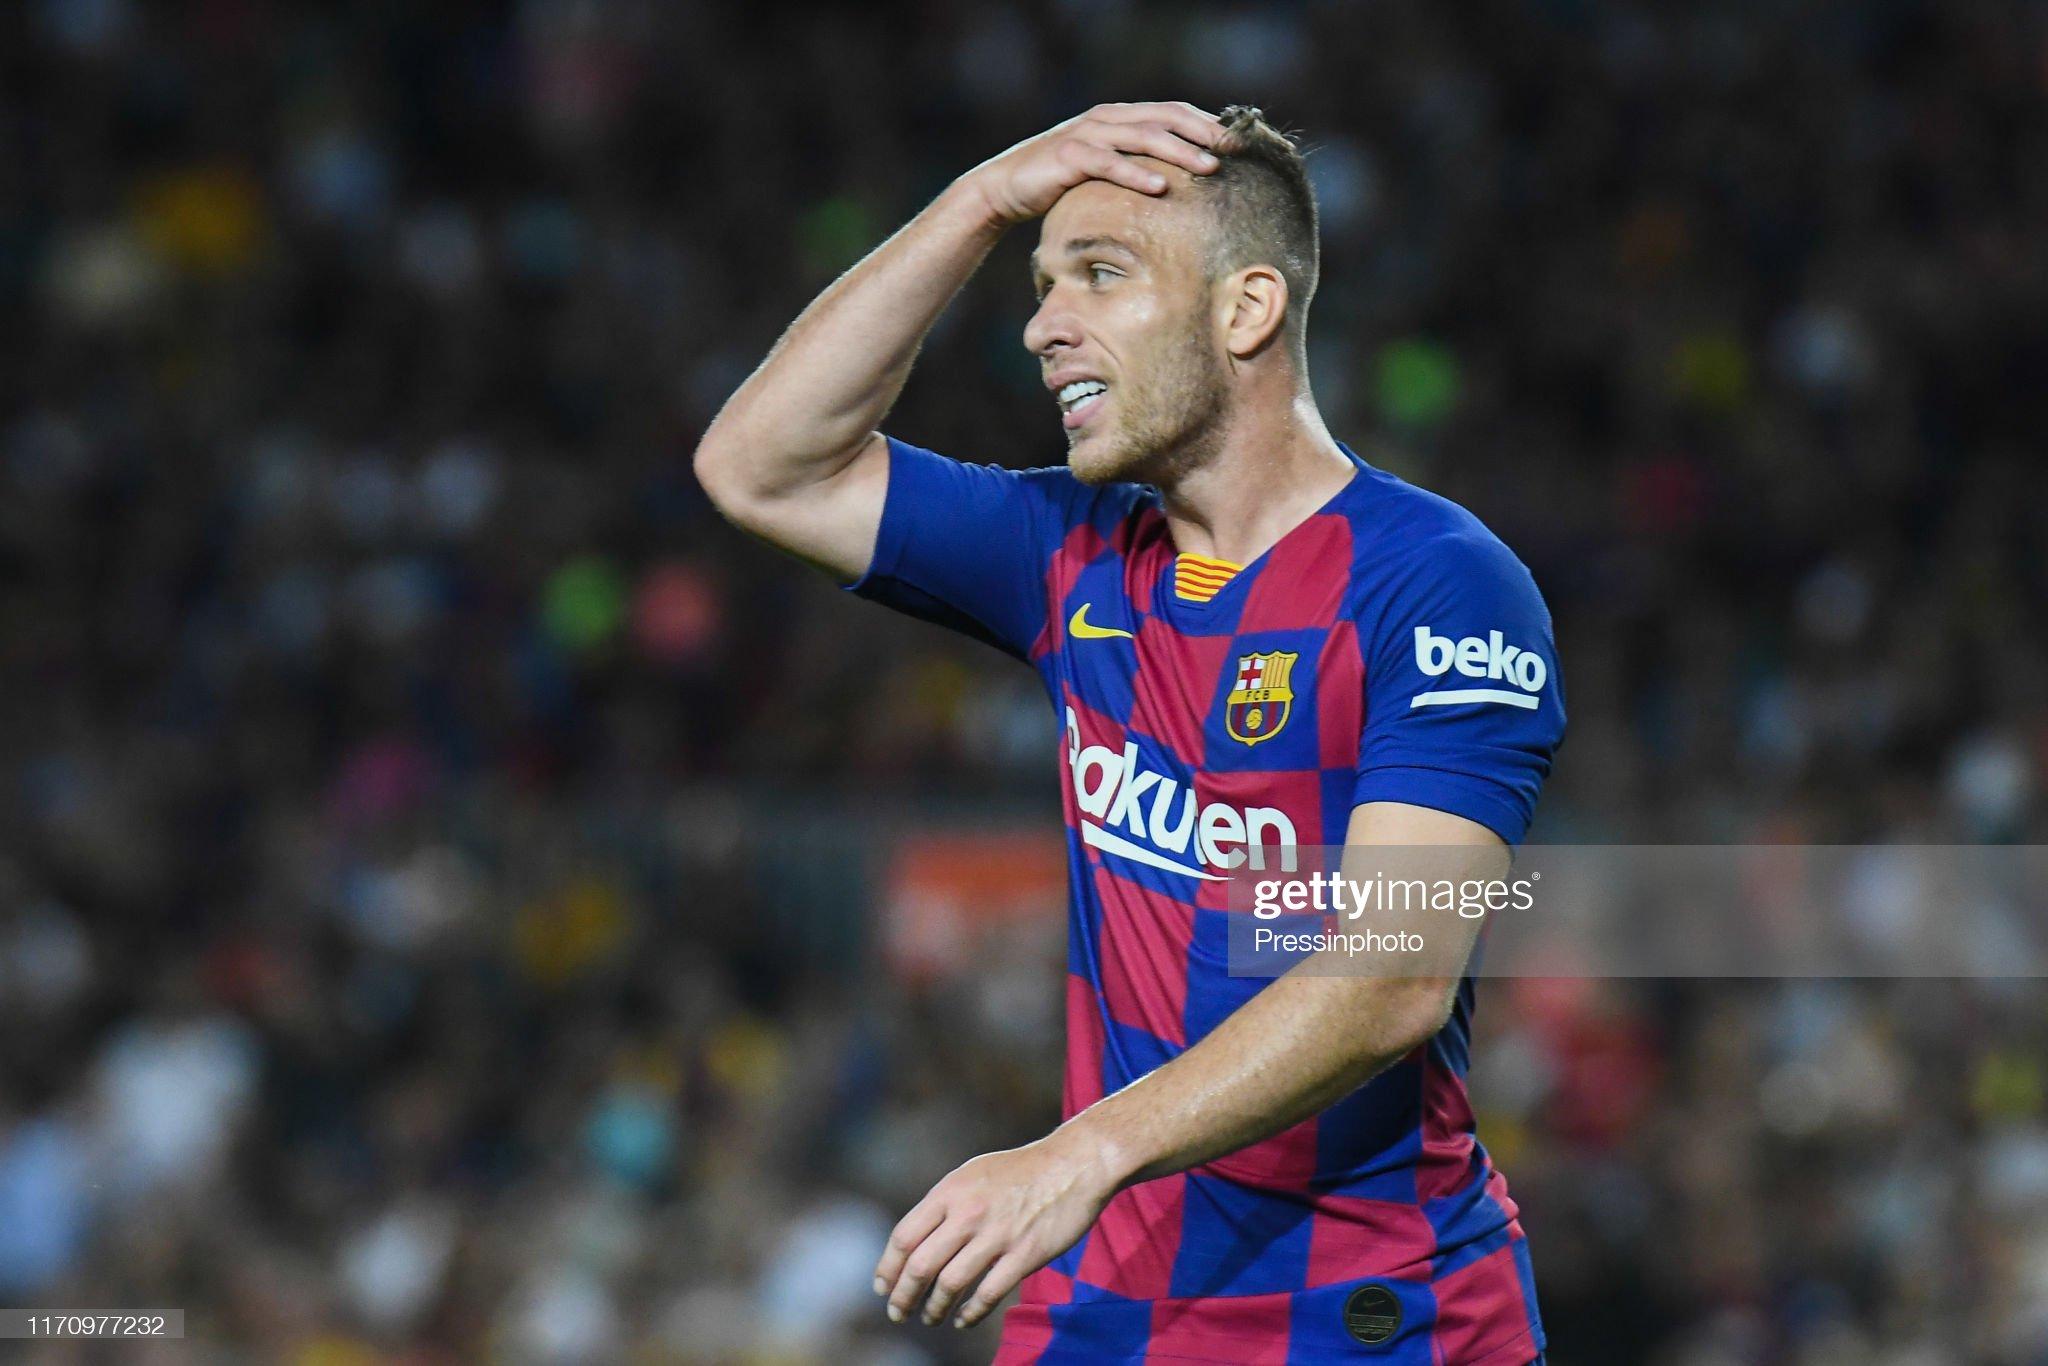 صور مباراة : برشلونة - فياريال 2-1 ( 24-09-2019 )  Arthur-melo-of-fc-barcelona-during-the-liga-match-between-barcelona-picture-id1170977232?s=2048x2048